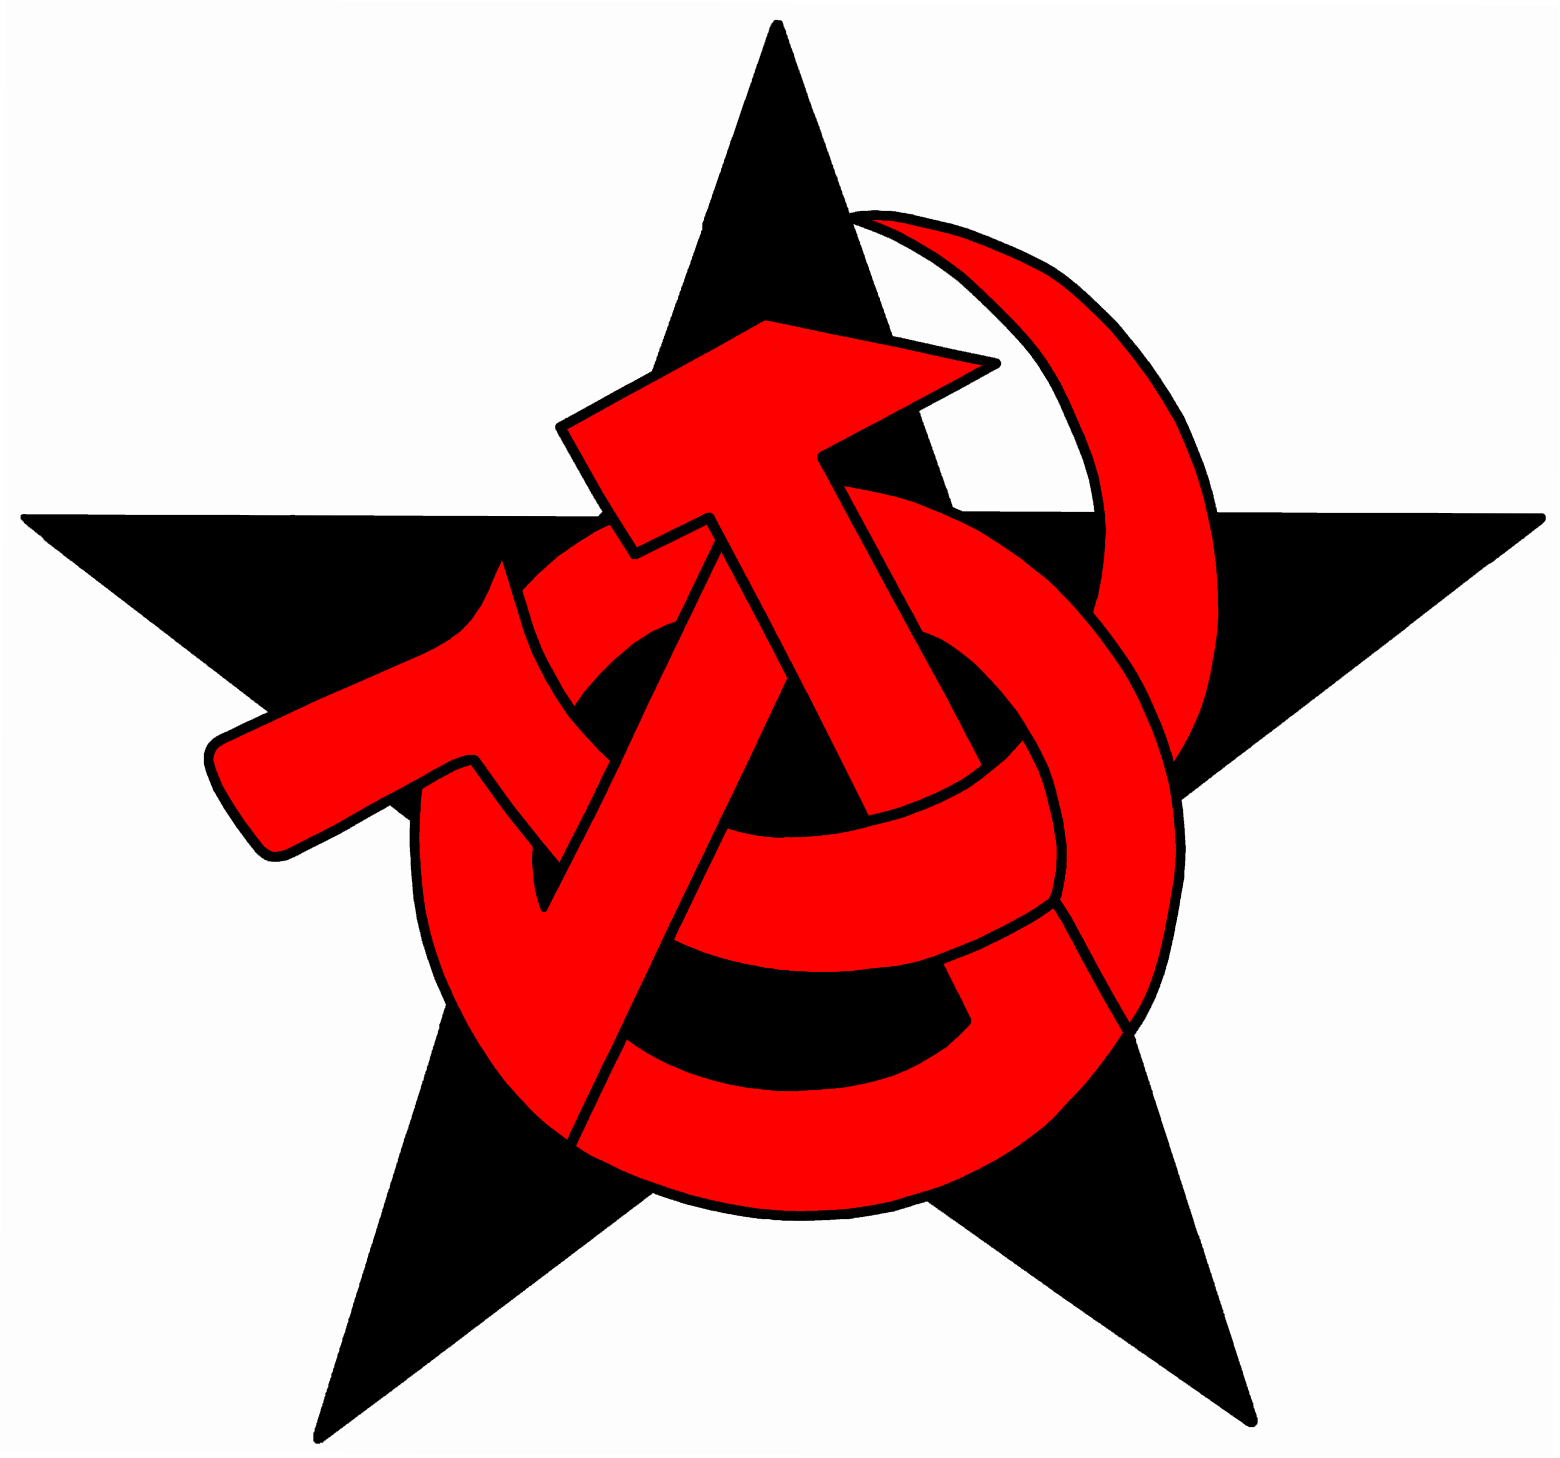 Anarcho capitalism wikipedia the free encyclopedia